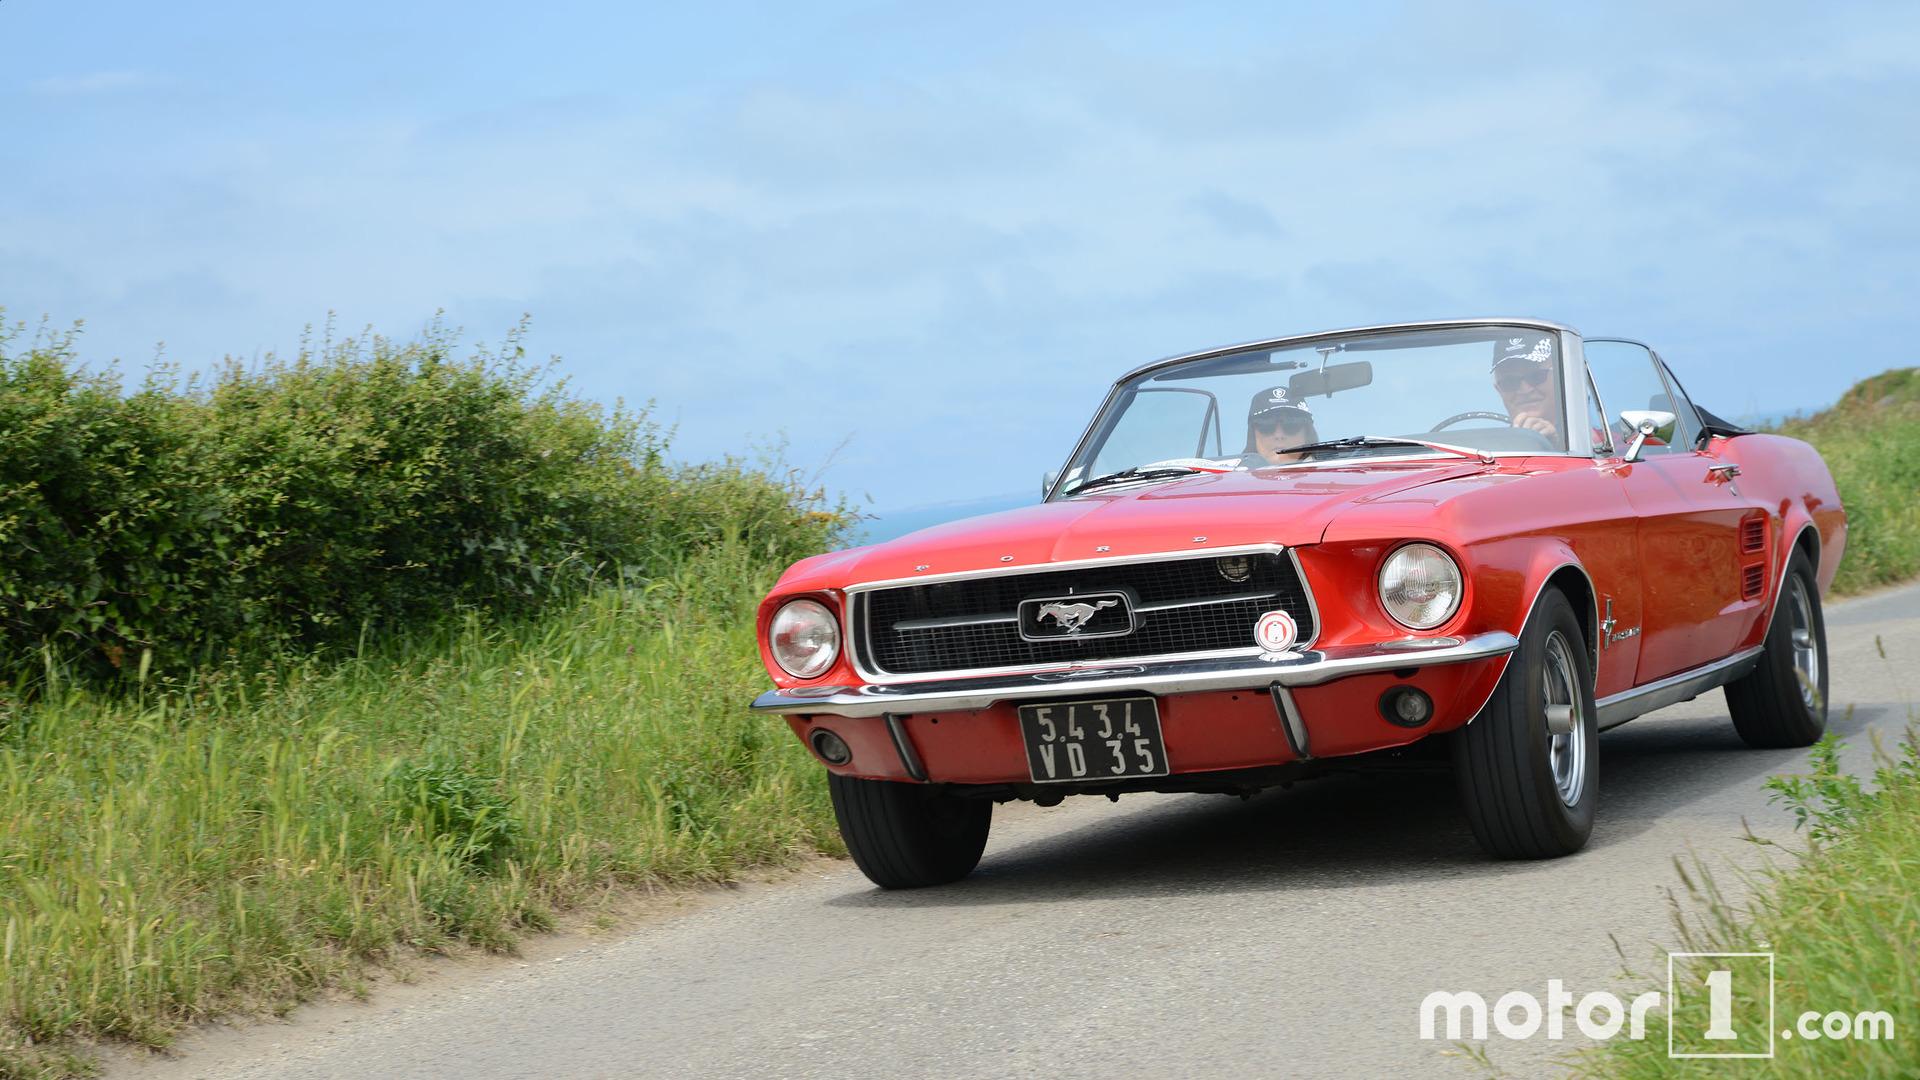 Essai Ford Mustang 289 de 1967 - Machine à rêves